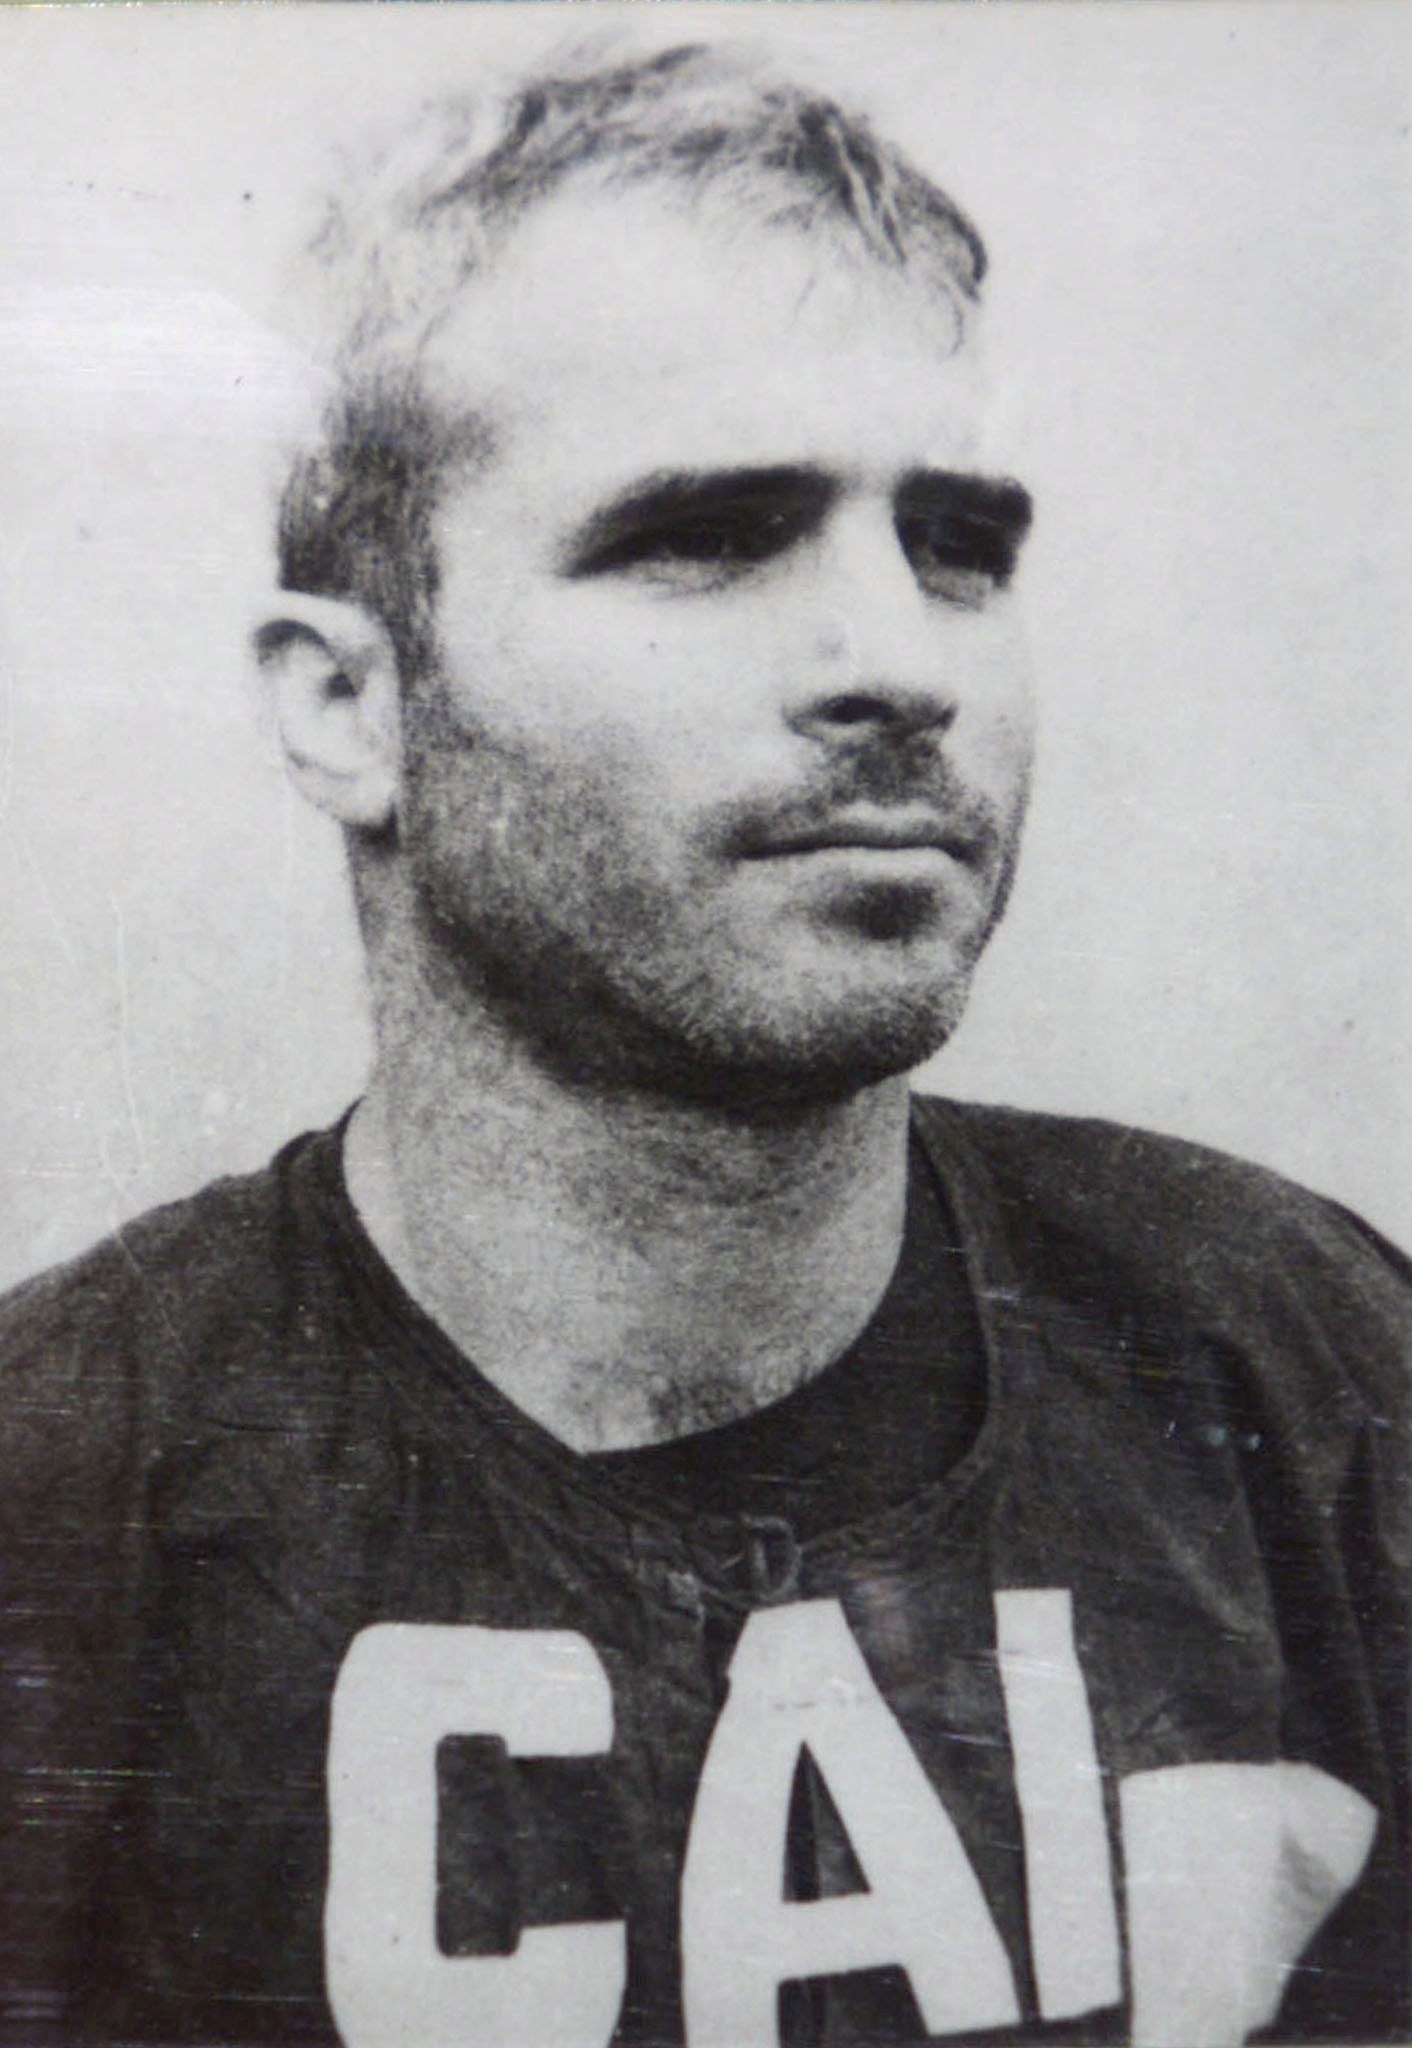 السيناتور جون ماكين